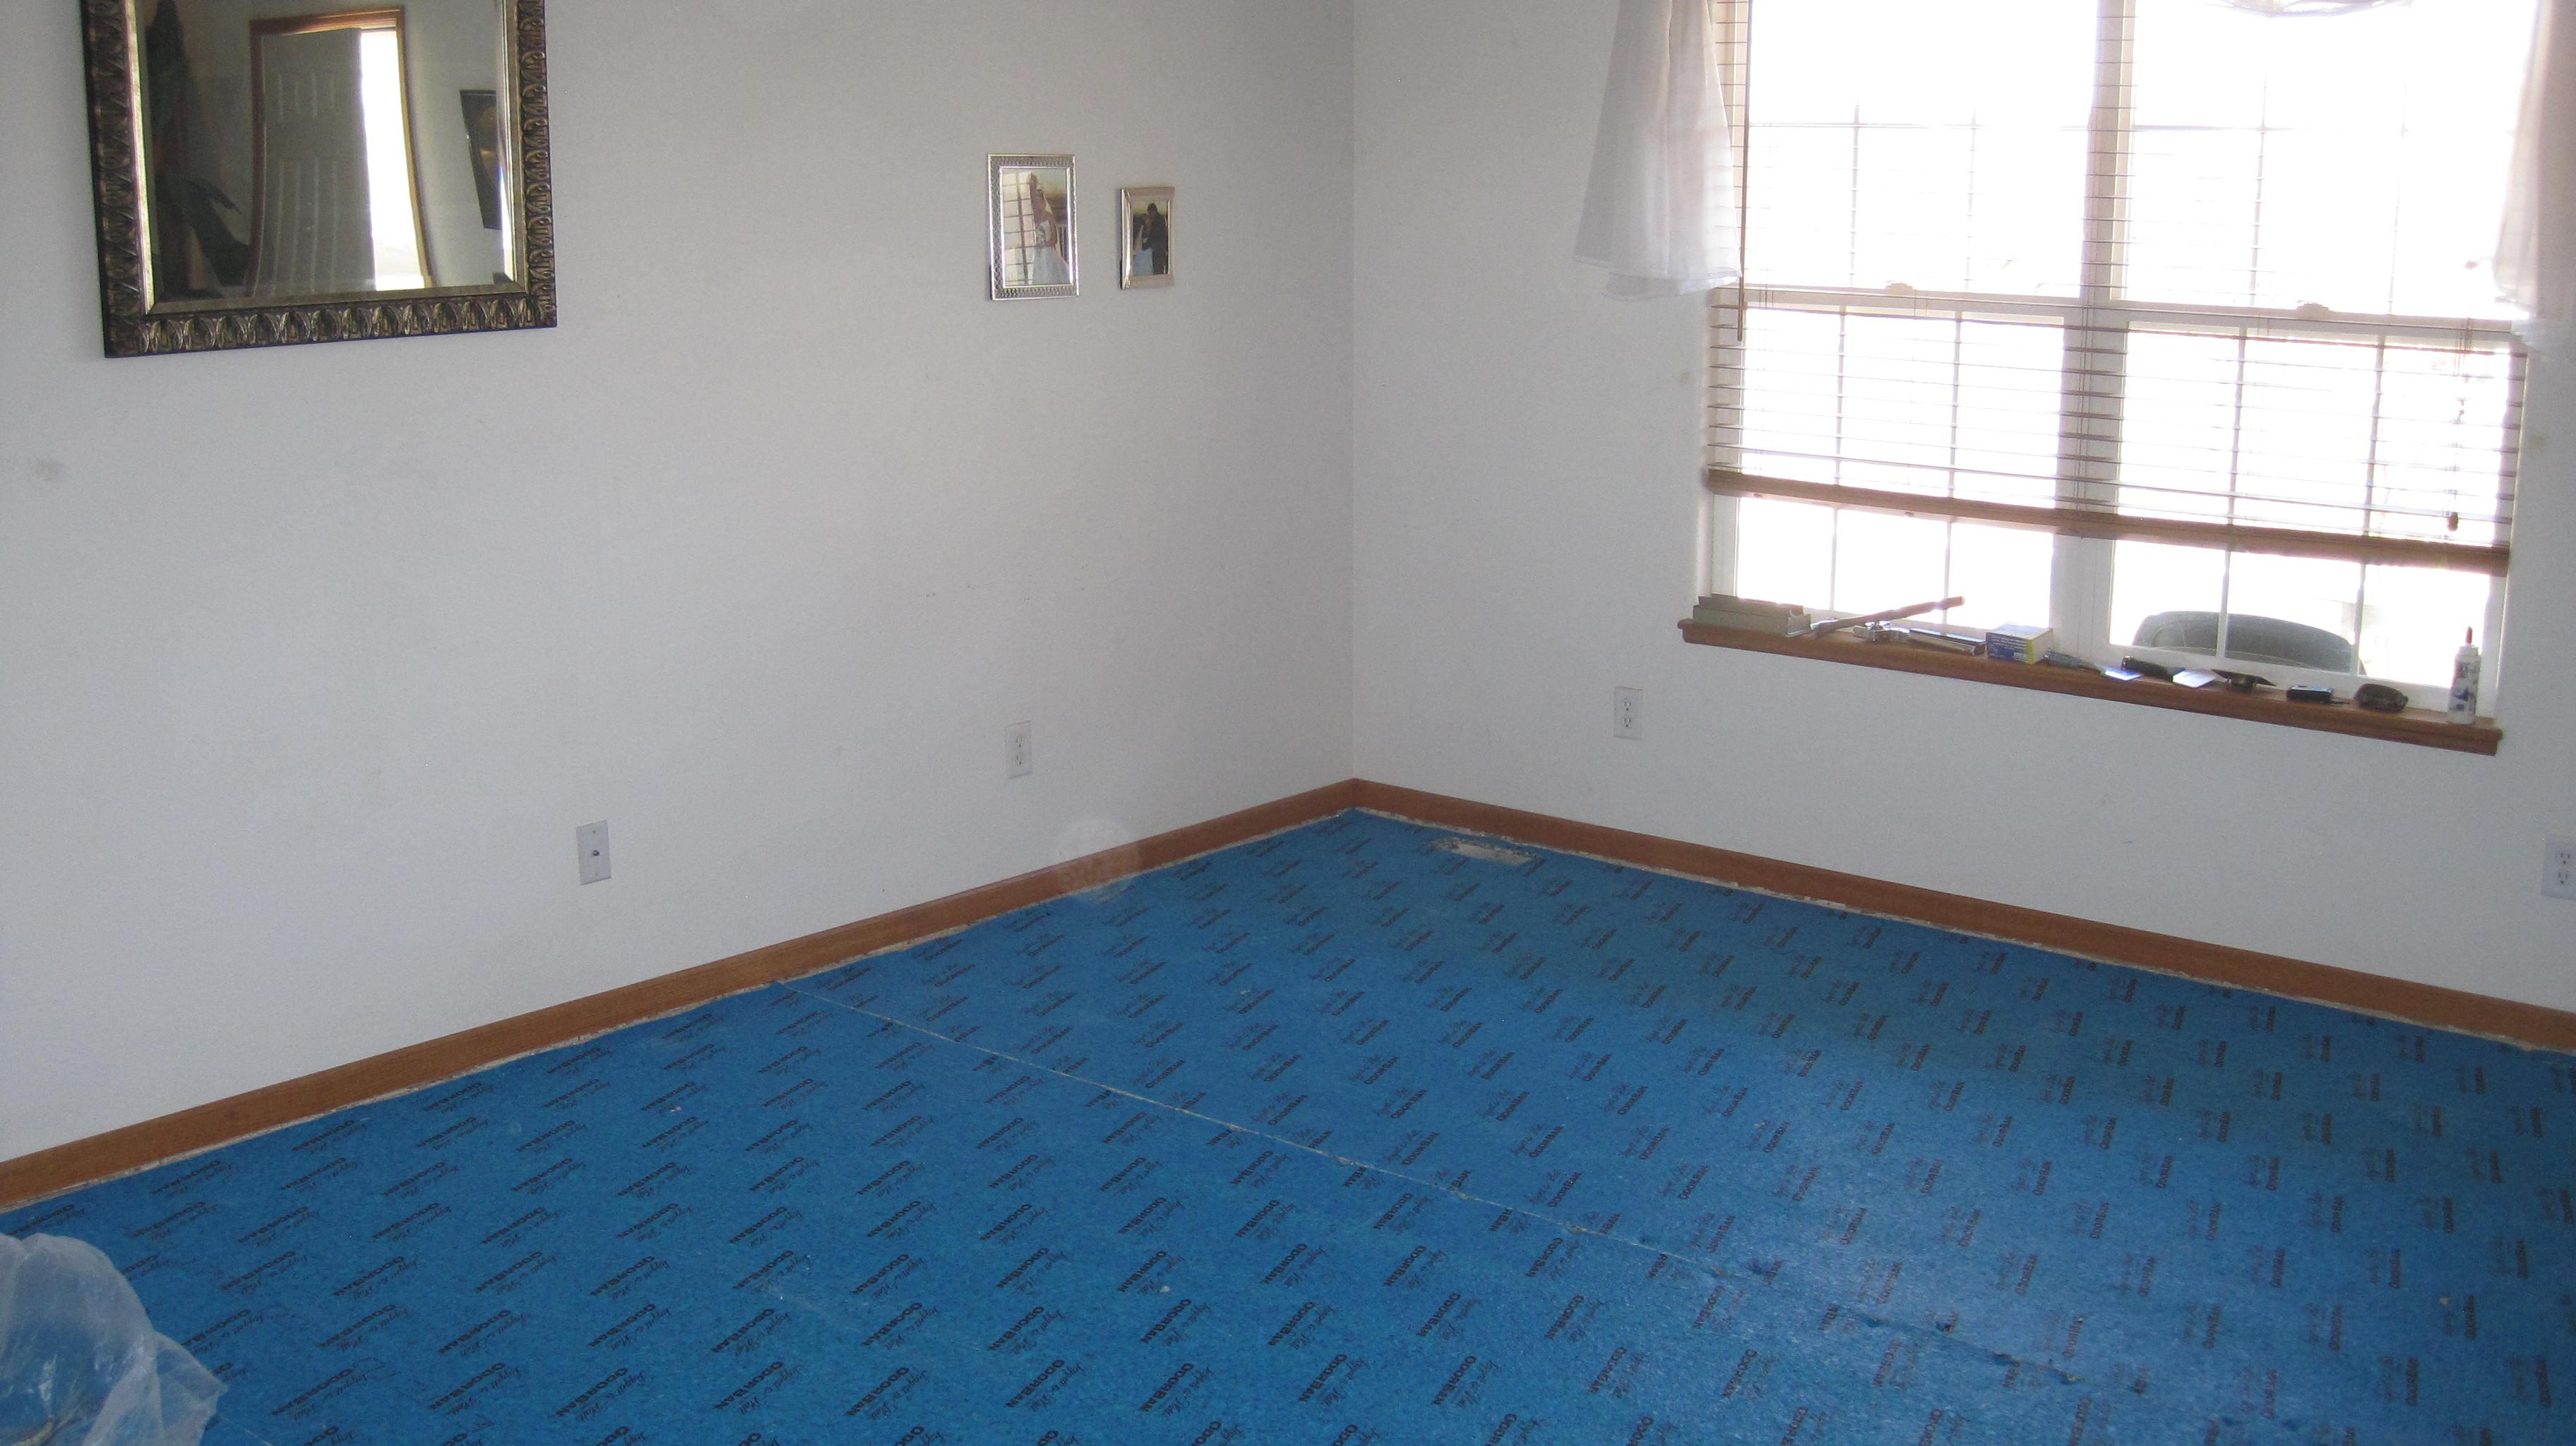 Living Room Carpet Renovating Ideas